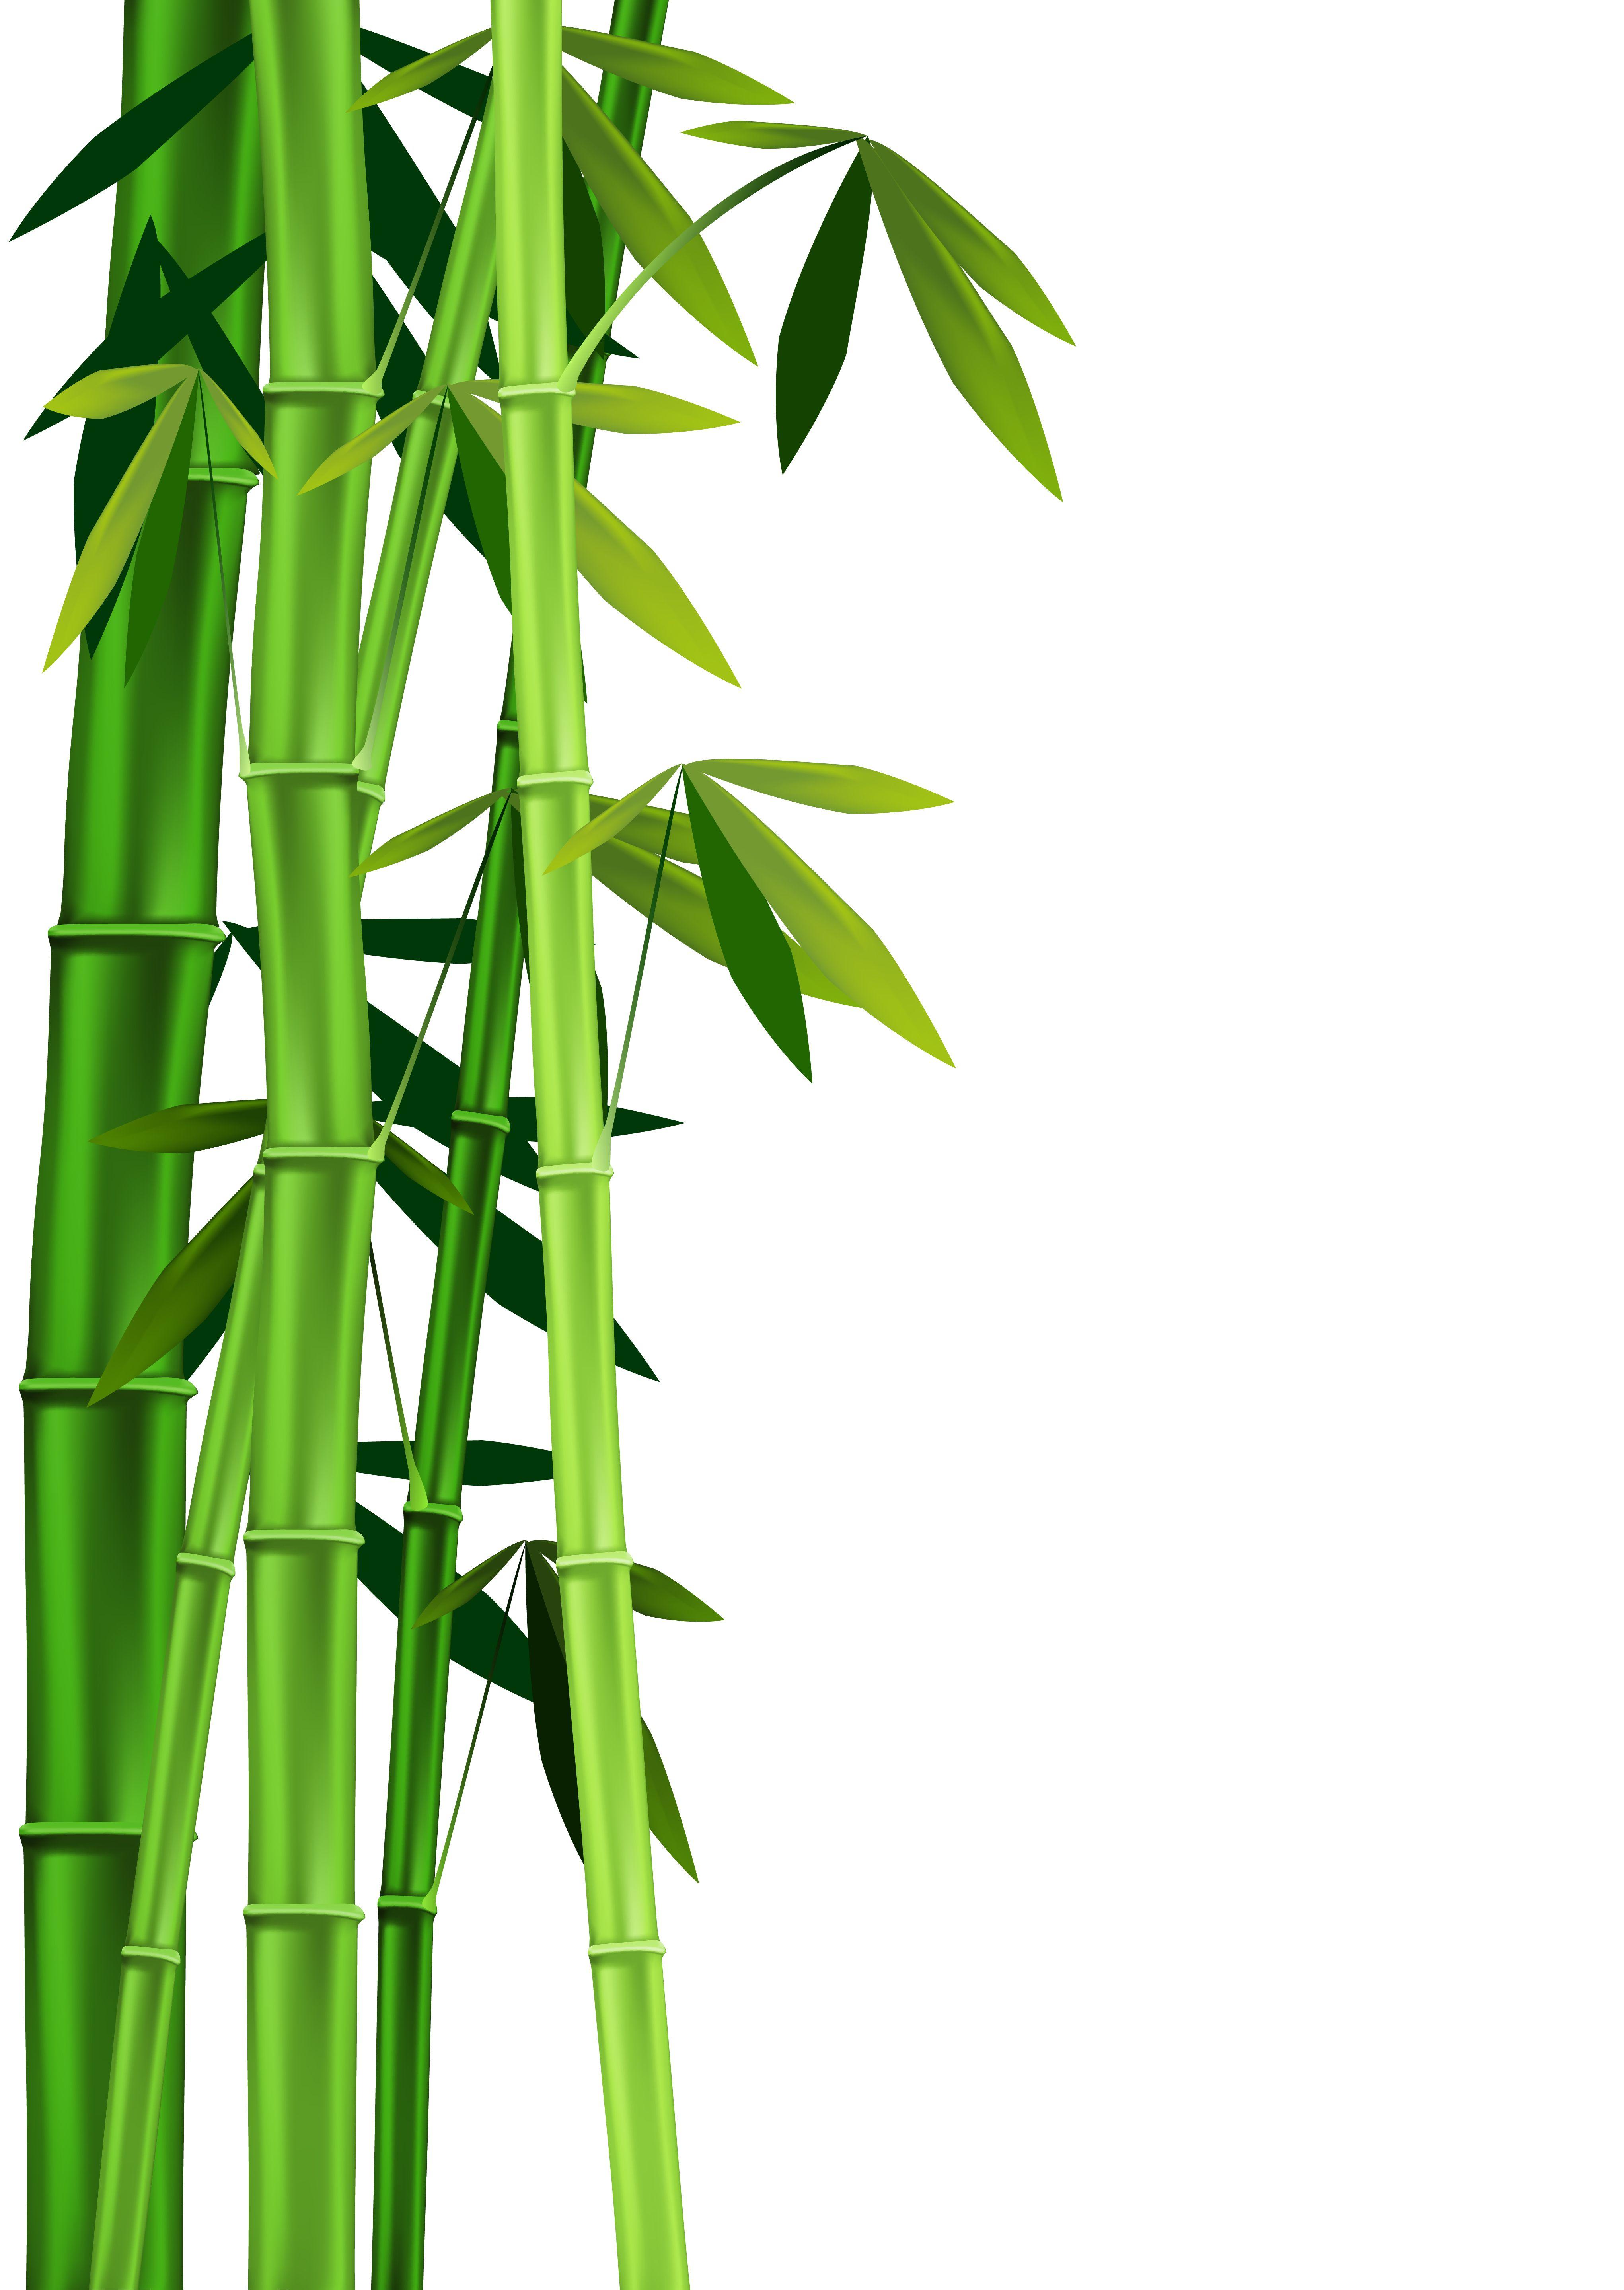 Bamboo Art Design : Images of bamboo google search panda ideas pinterest